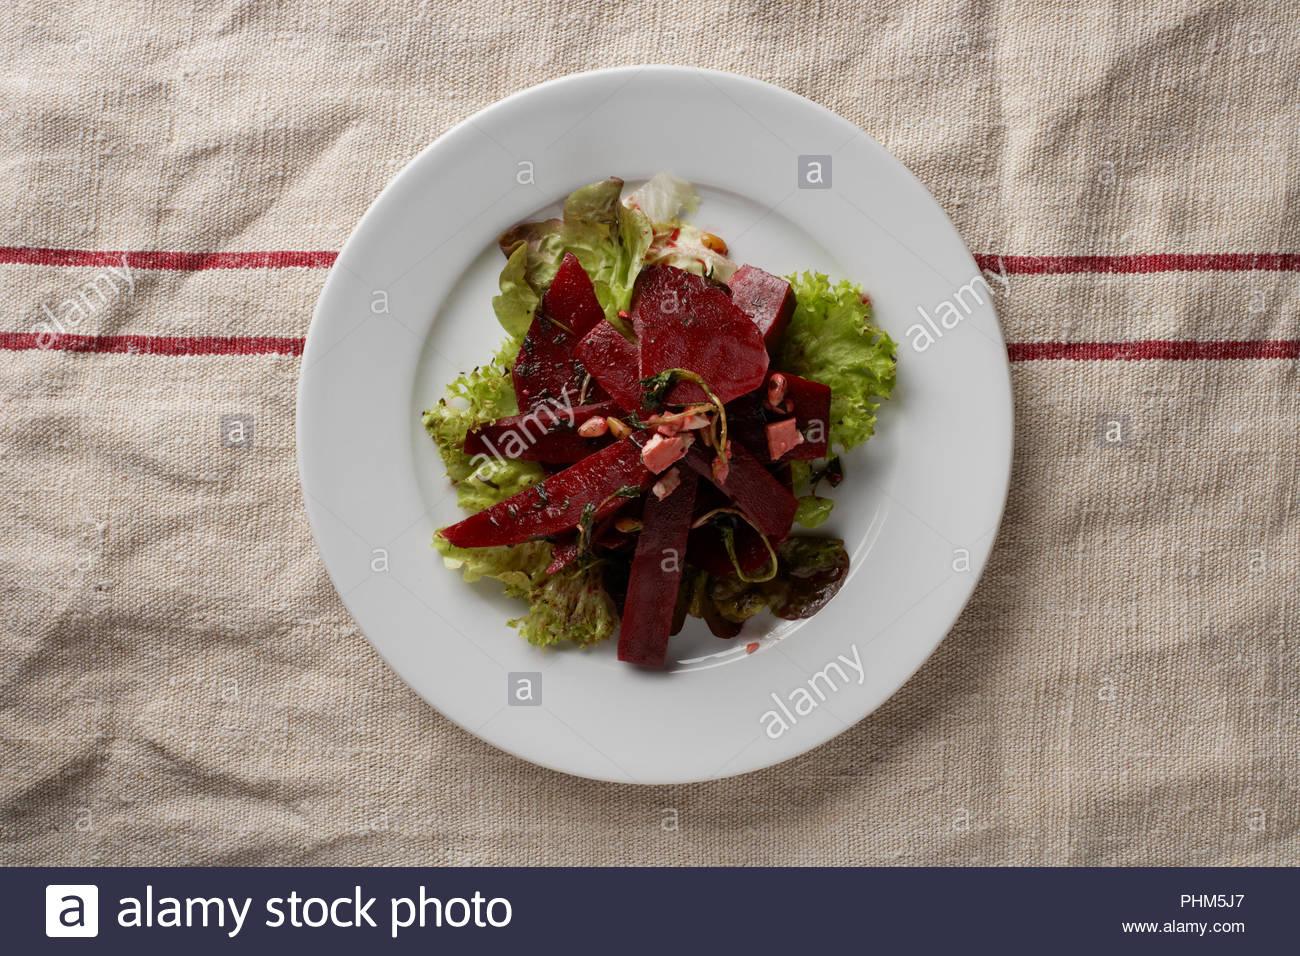 Beetroot salad - Stock Image